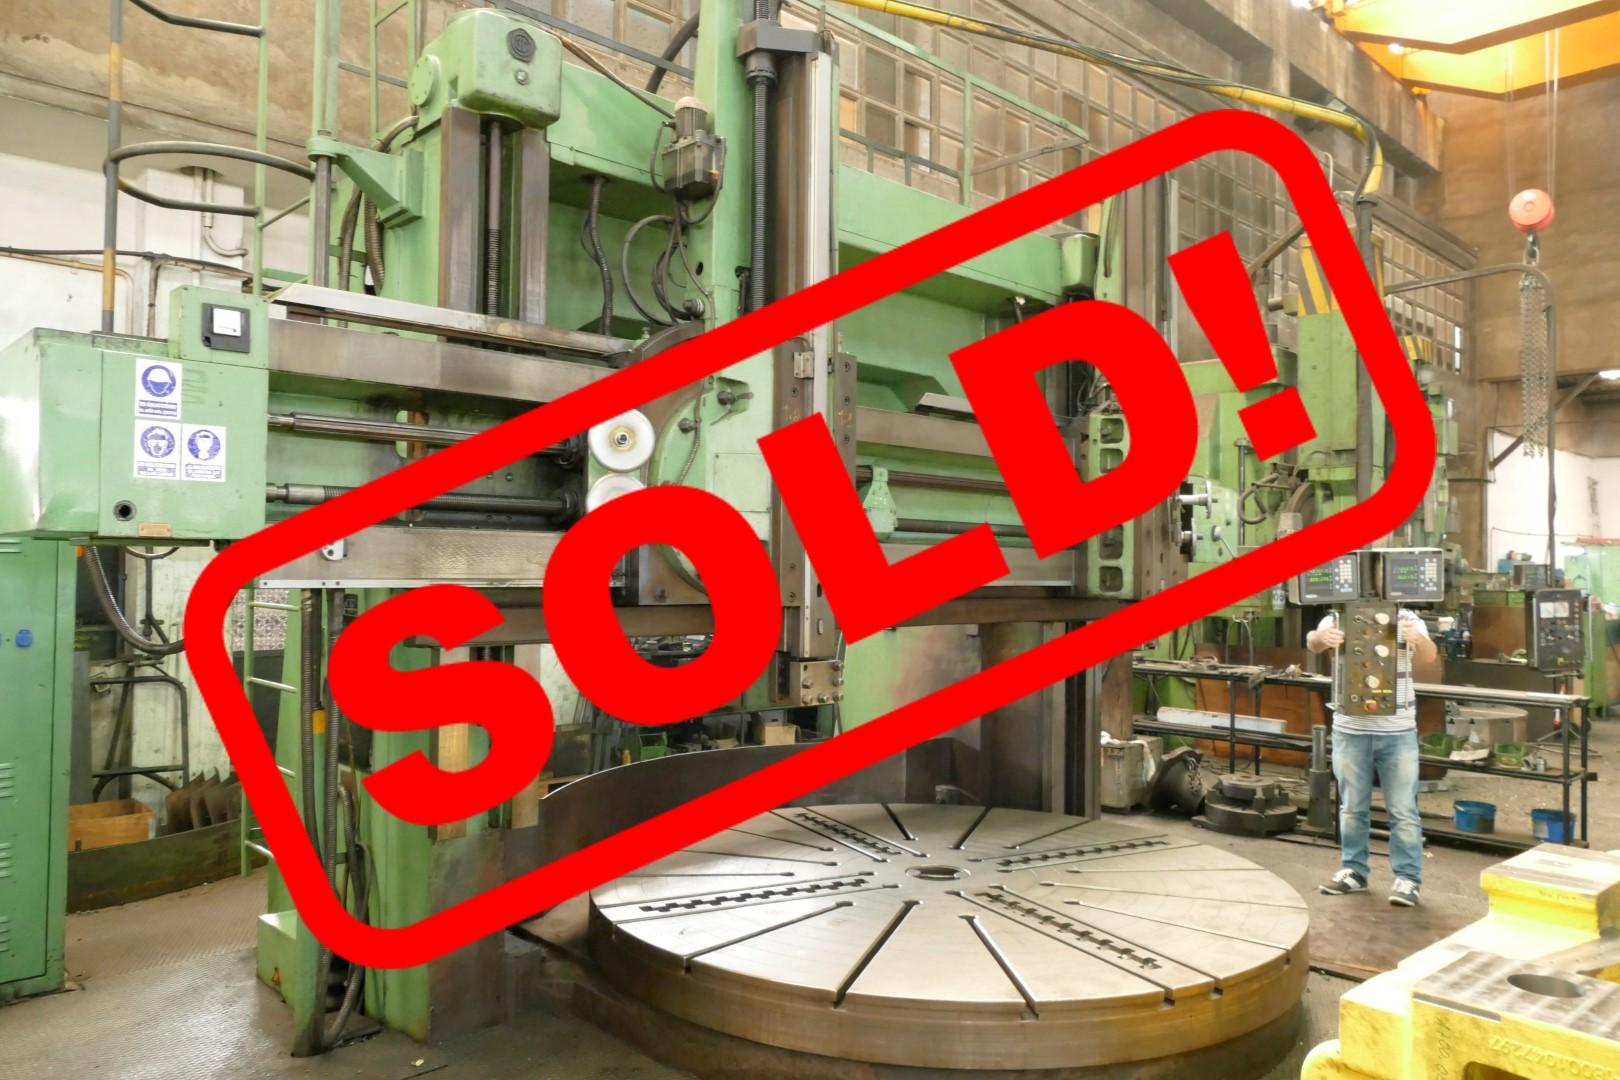 04305.1-sedin 1532.1-sold